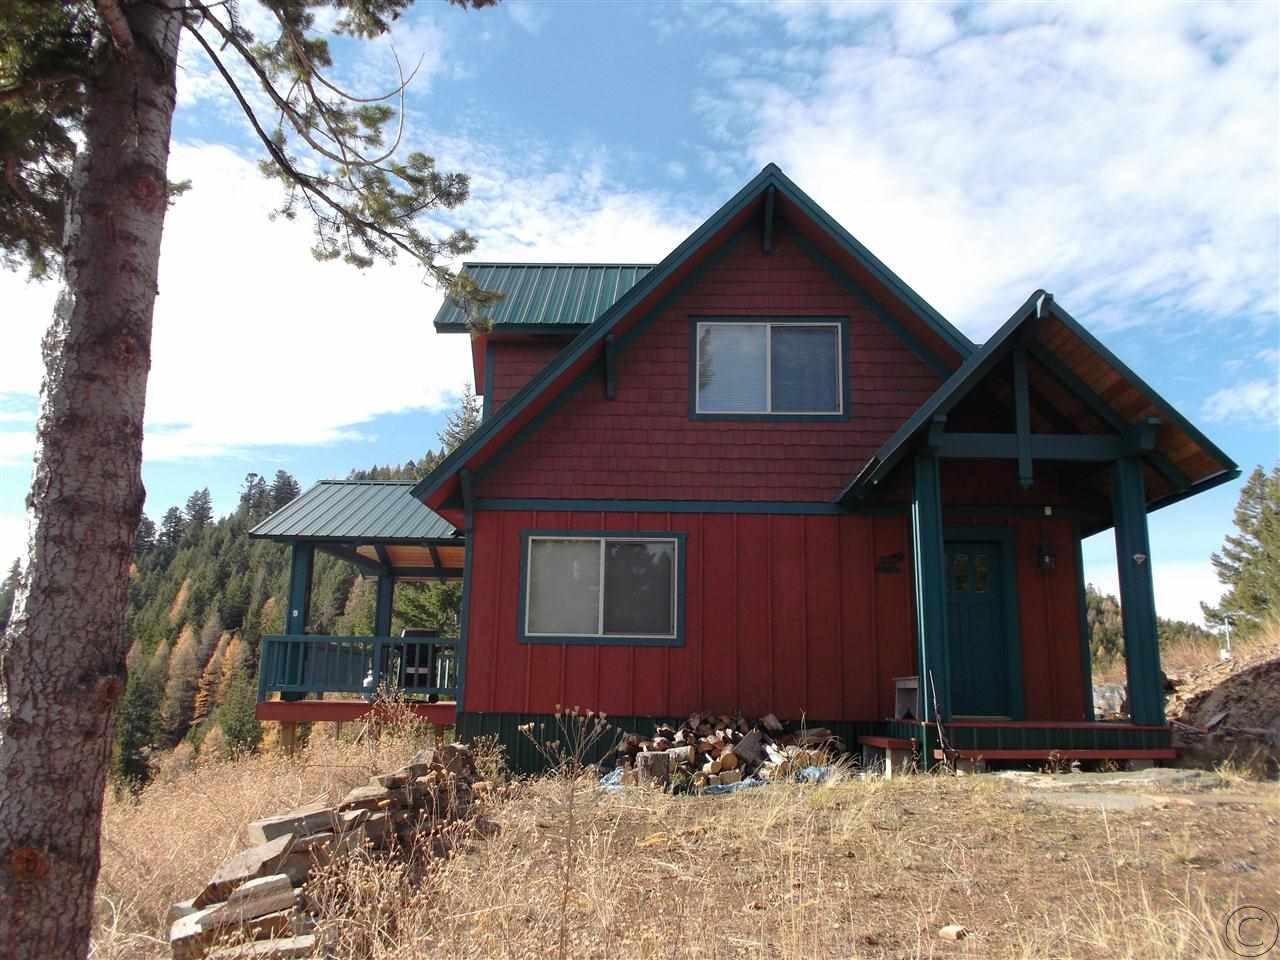 Real Estate for Sale, ListingId: 30947583, Paradise,MT59856